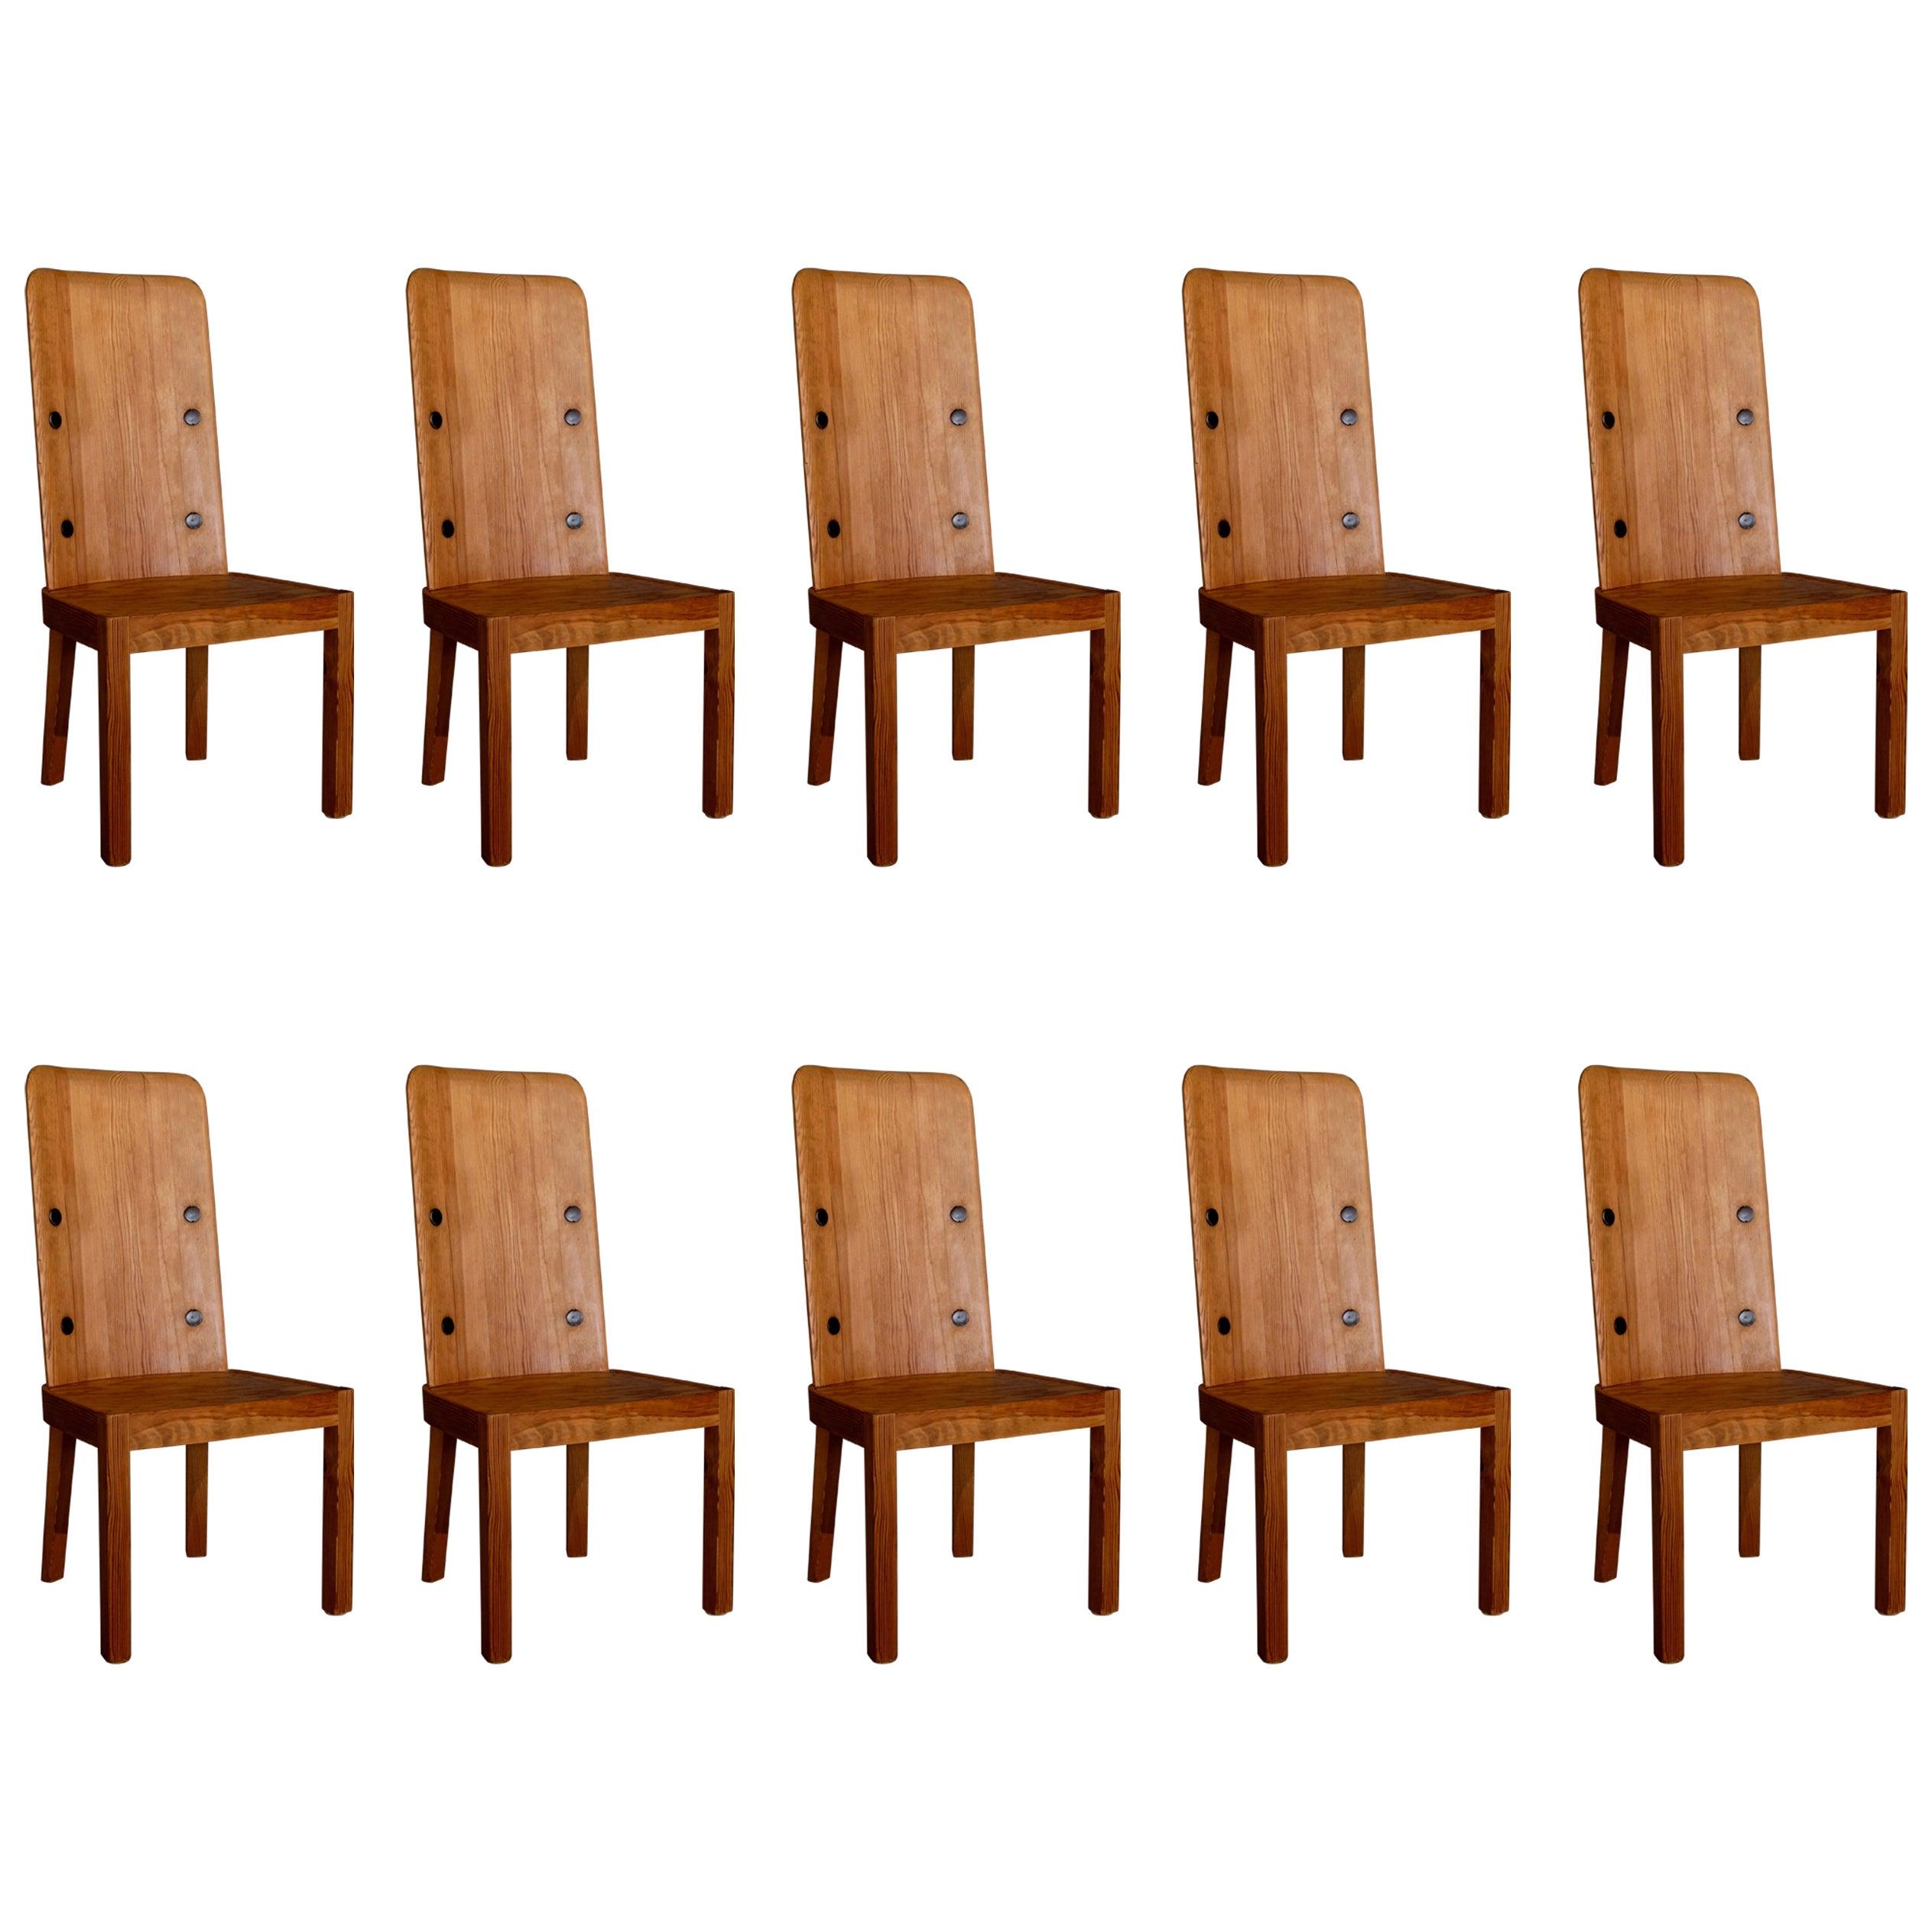 "Set of Ten ""Lovö"" Chairs by Axel Einar-Hjorth, 1930s"